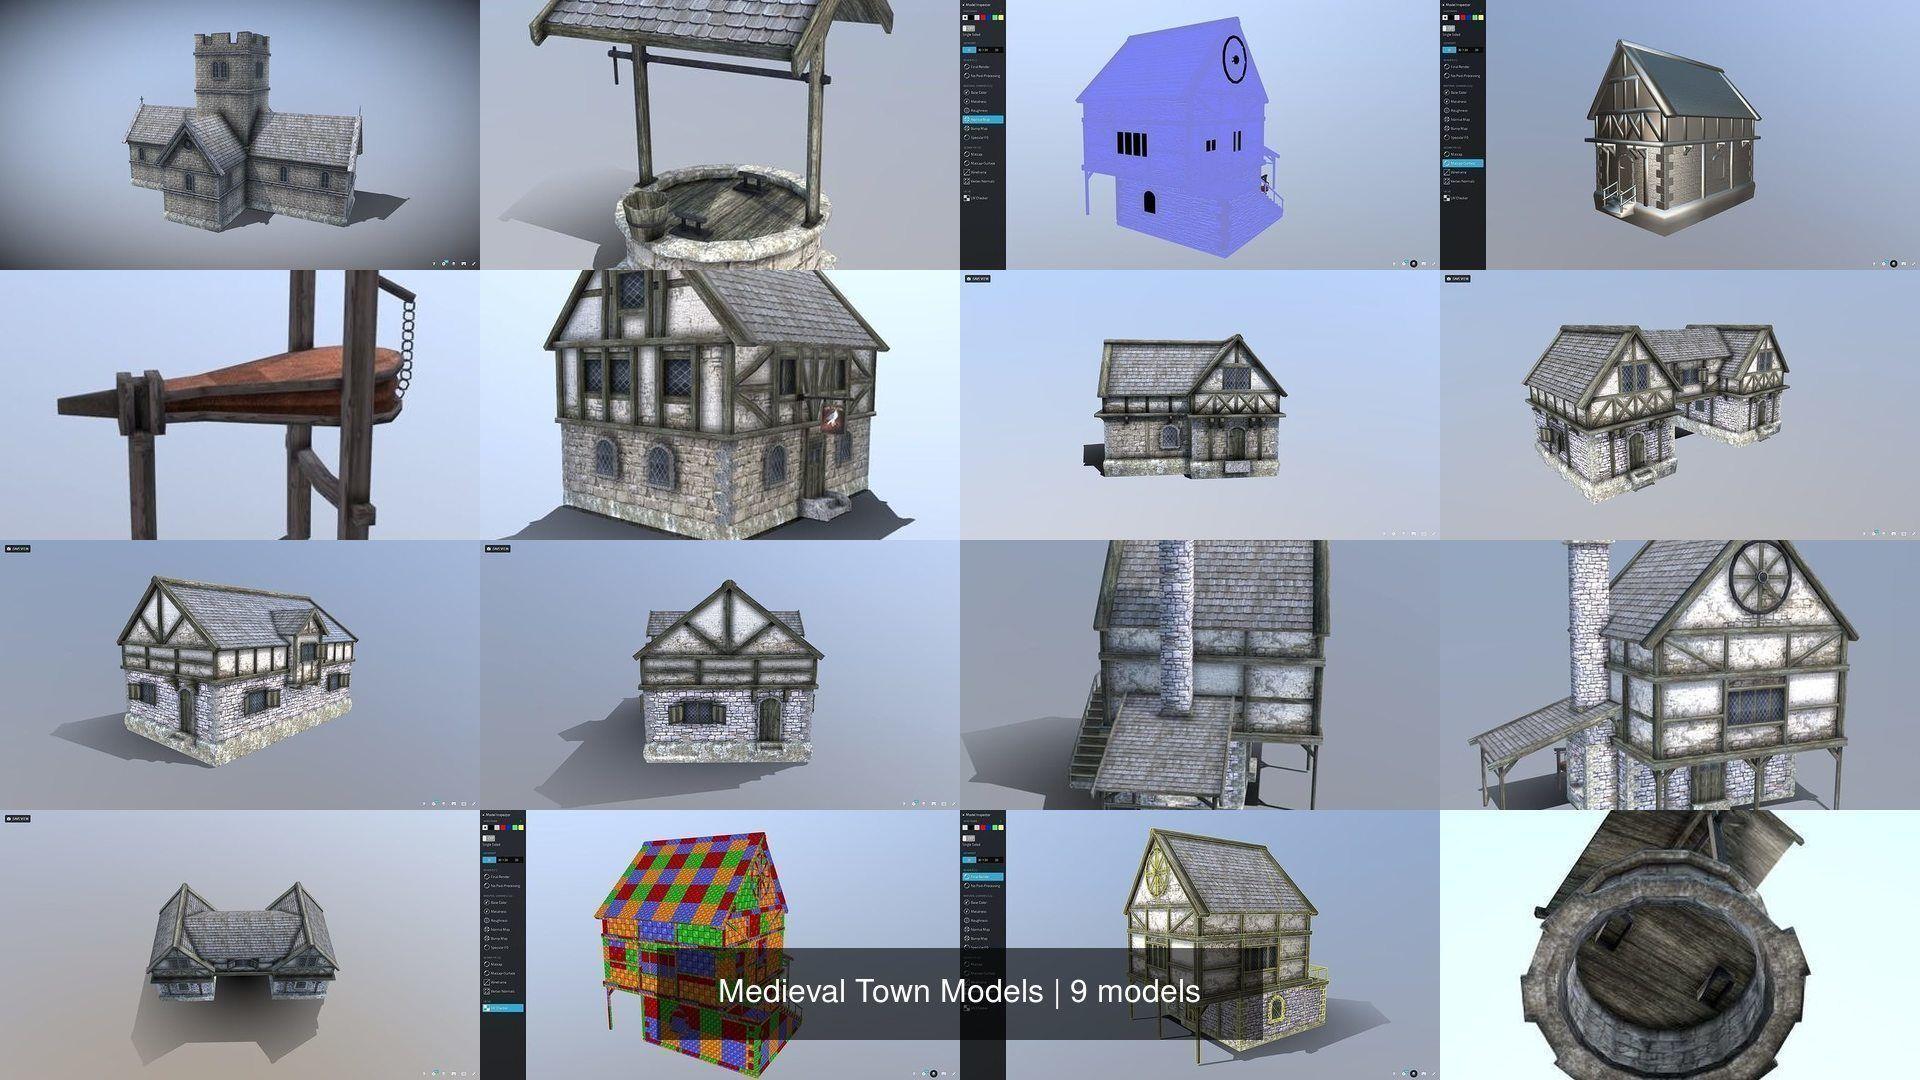 Medieval Town Models